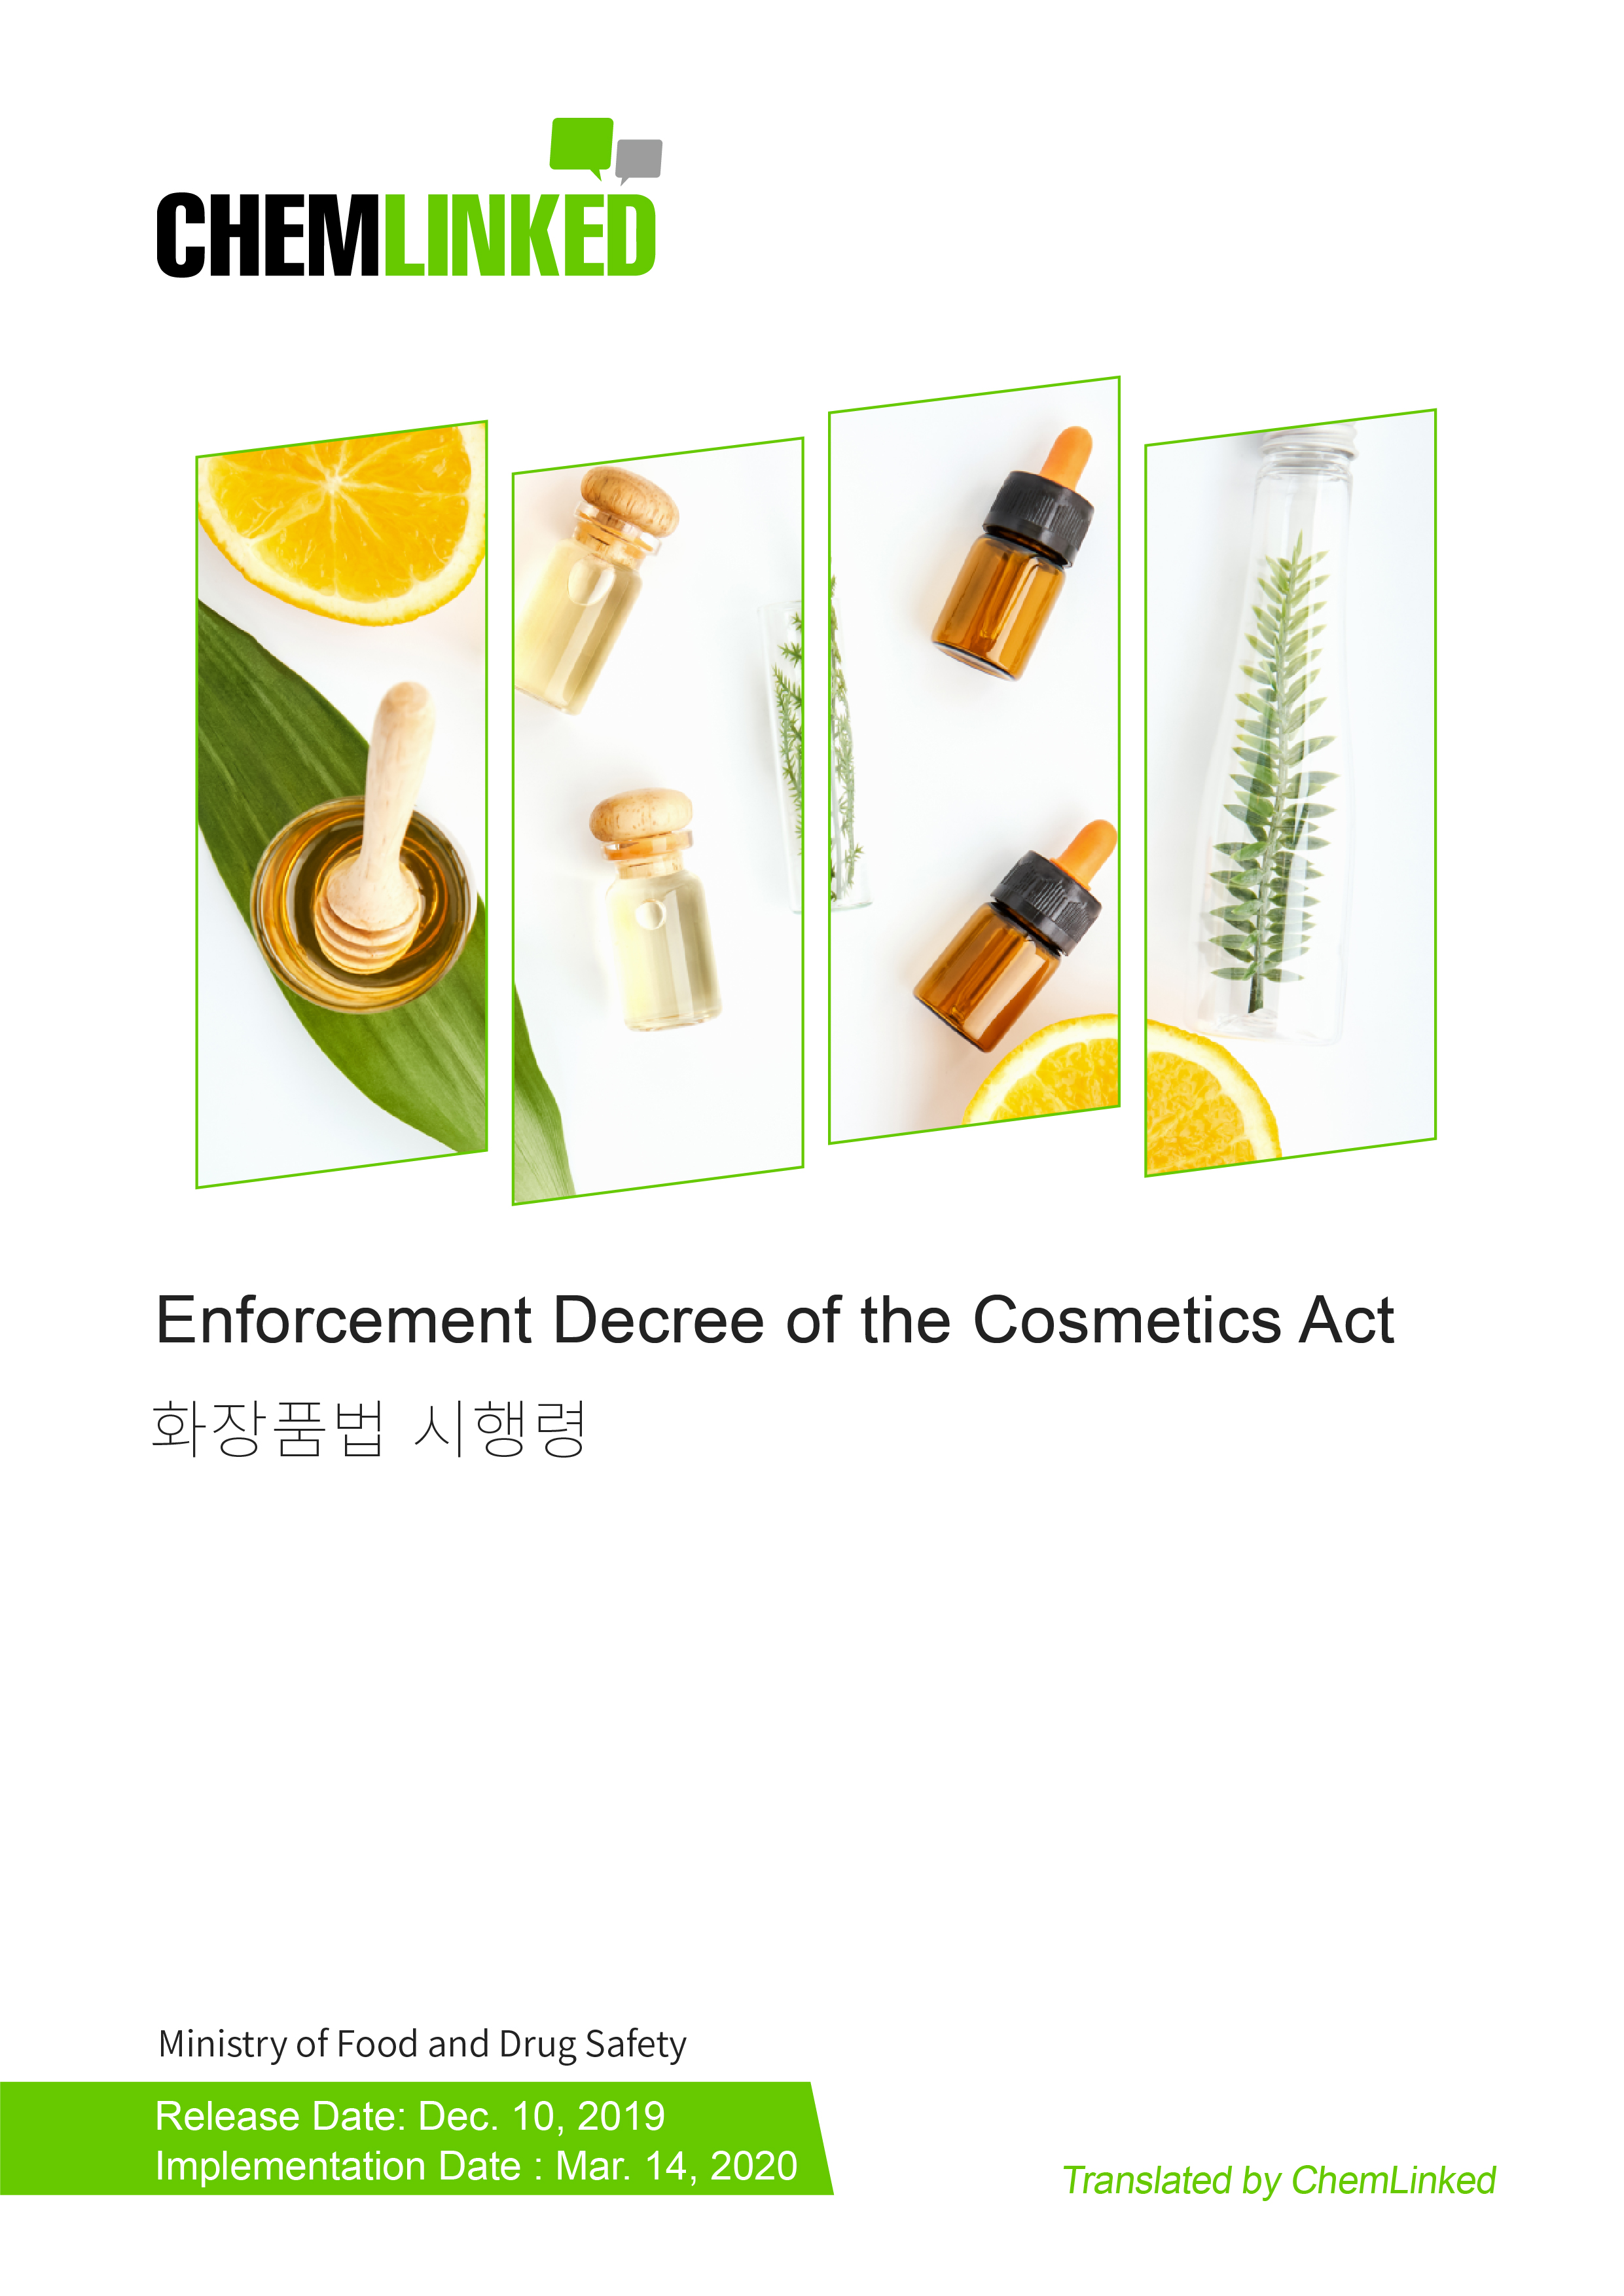 South Korea Enforcement Decree of the Cosmetics Act (No. 30245)